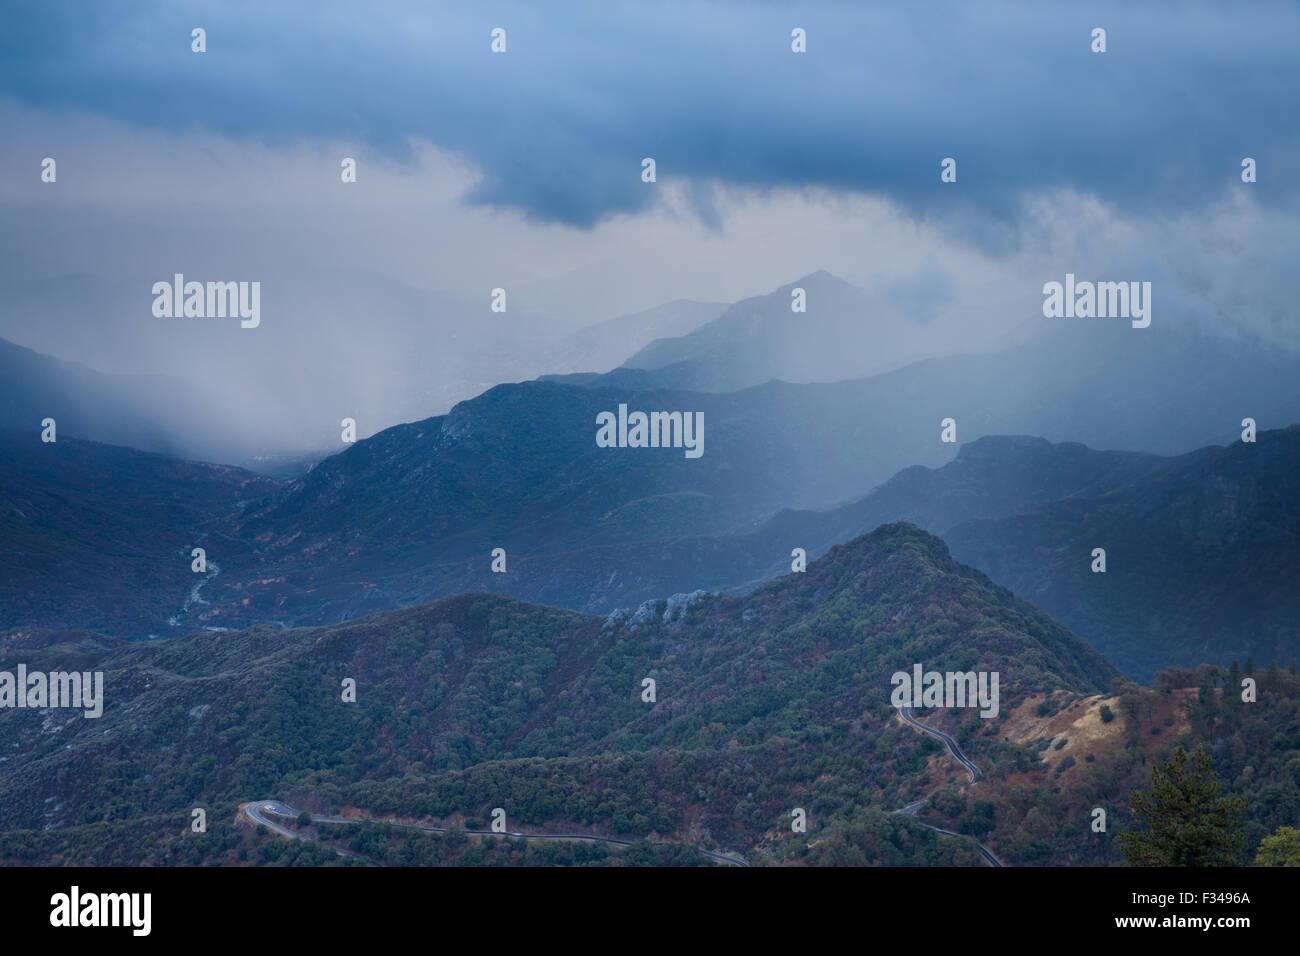 La Valle Kaweah, Sequoia National Park, California, Stati Uniti d'America Immagini Stock